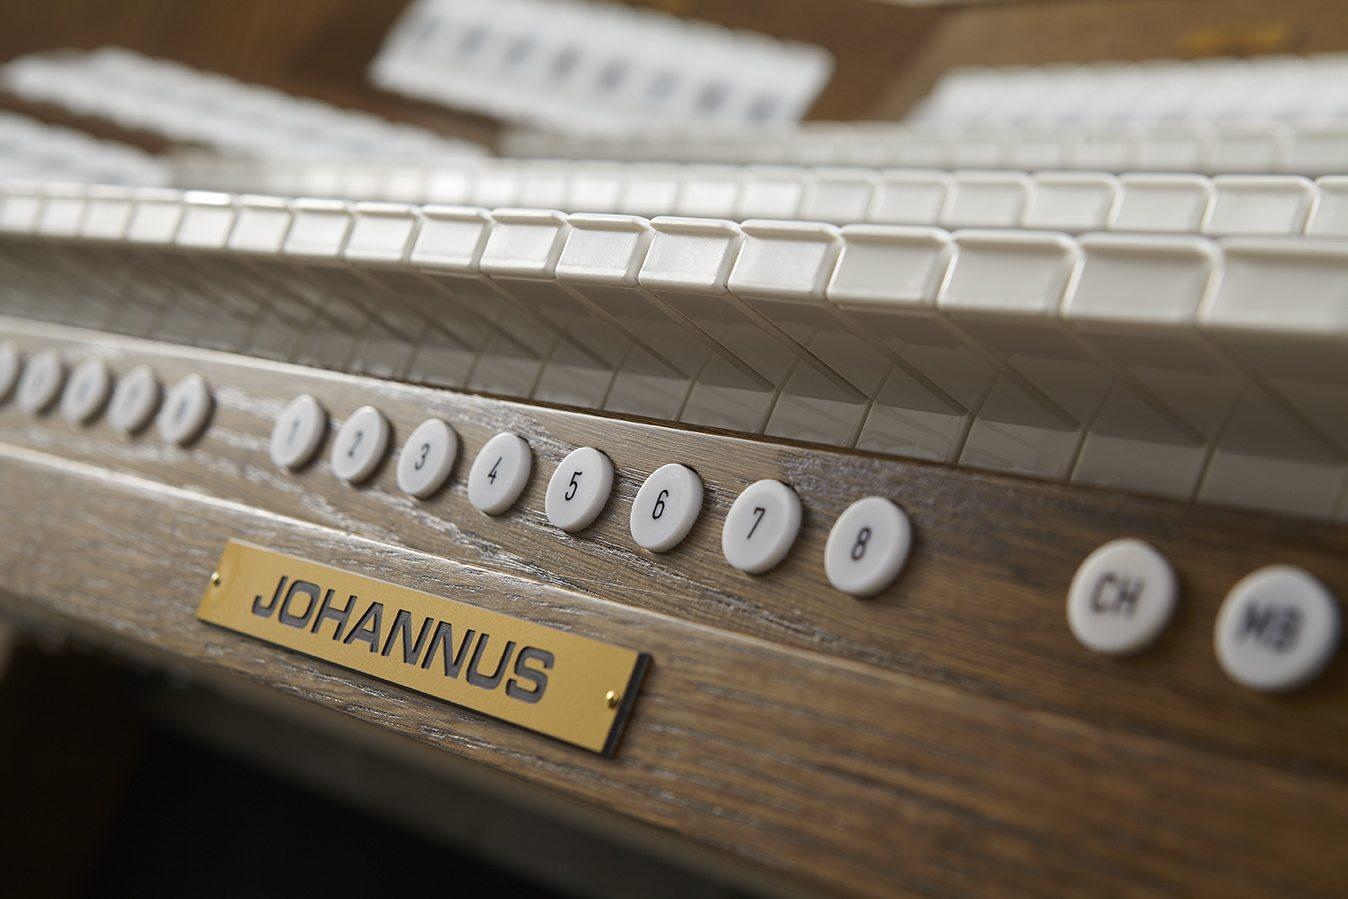 JOHANNUS VIVIALDI 370 DETAILS 0032